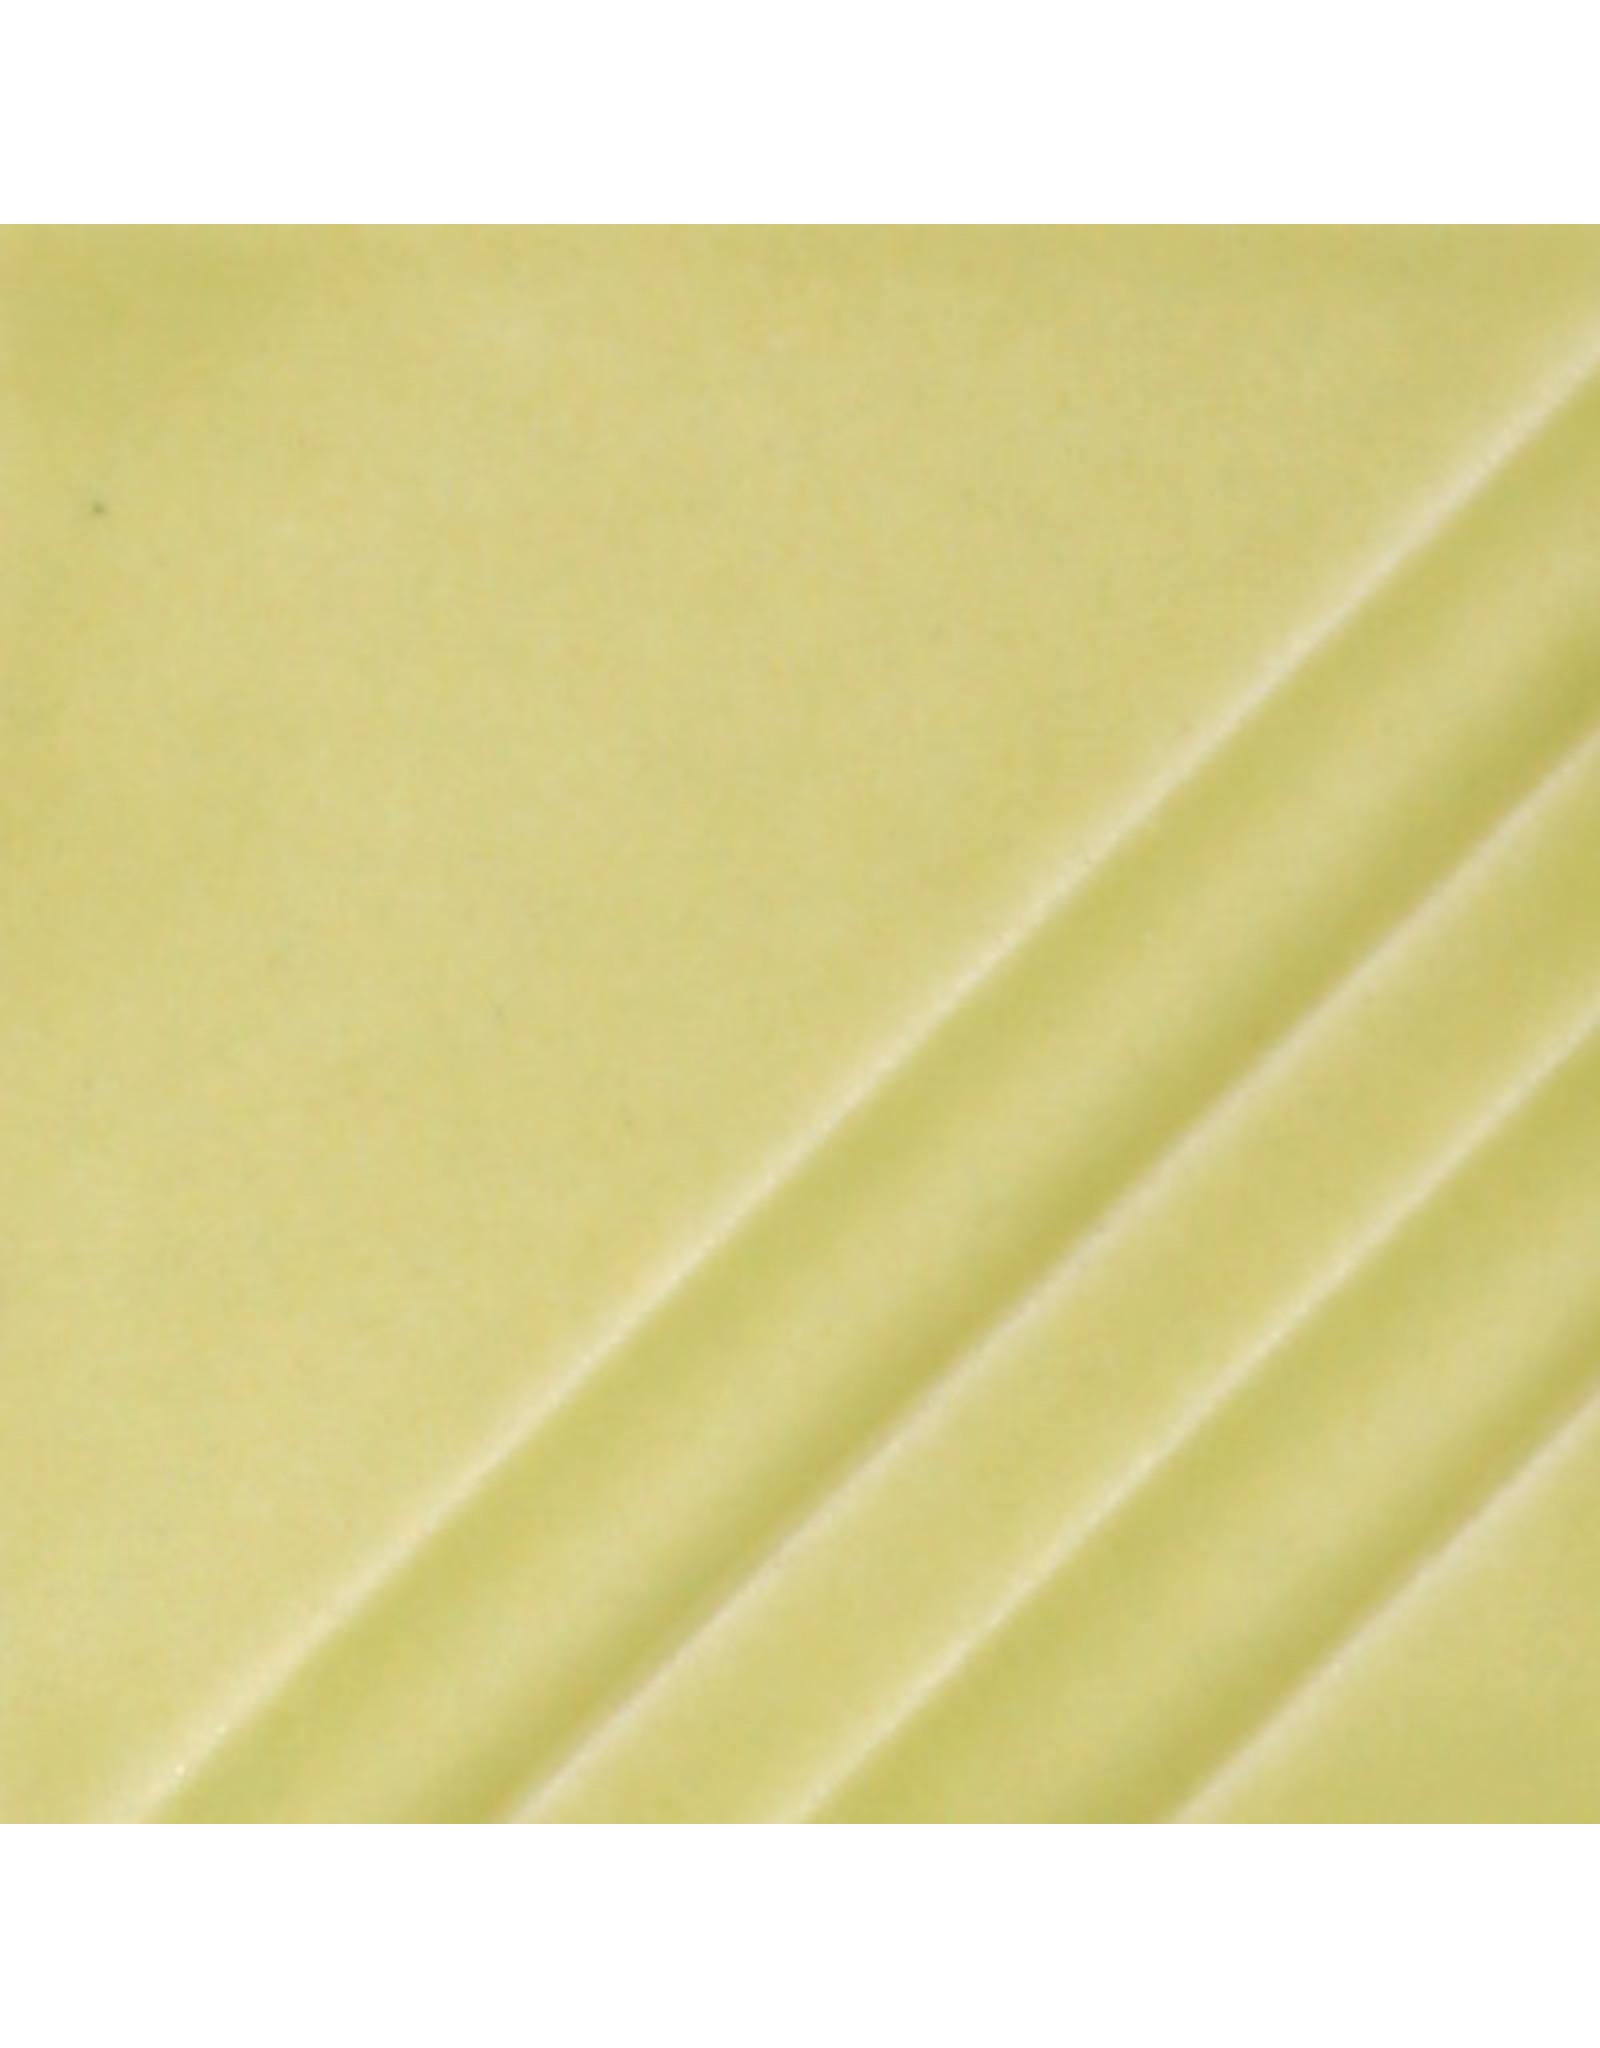 Mayco Mayco Foundations Celery 473ml